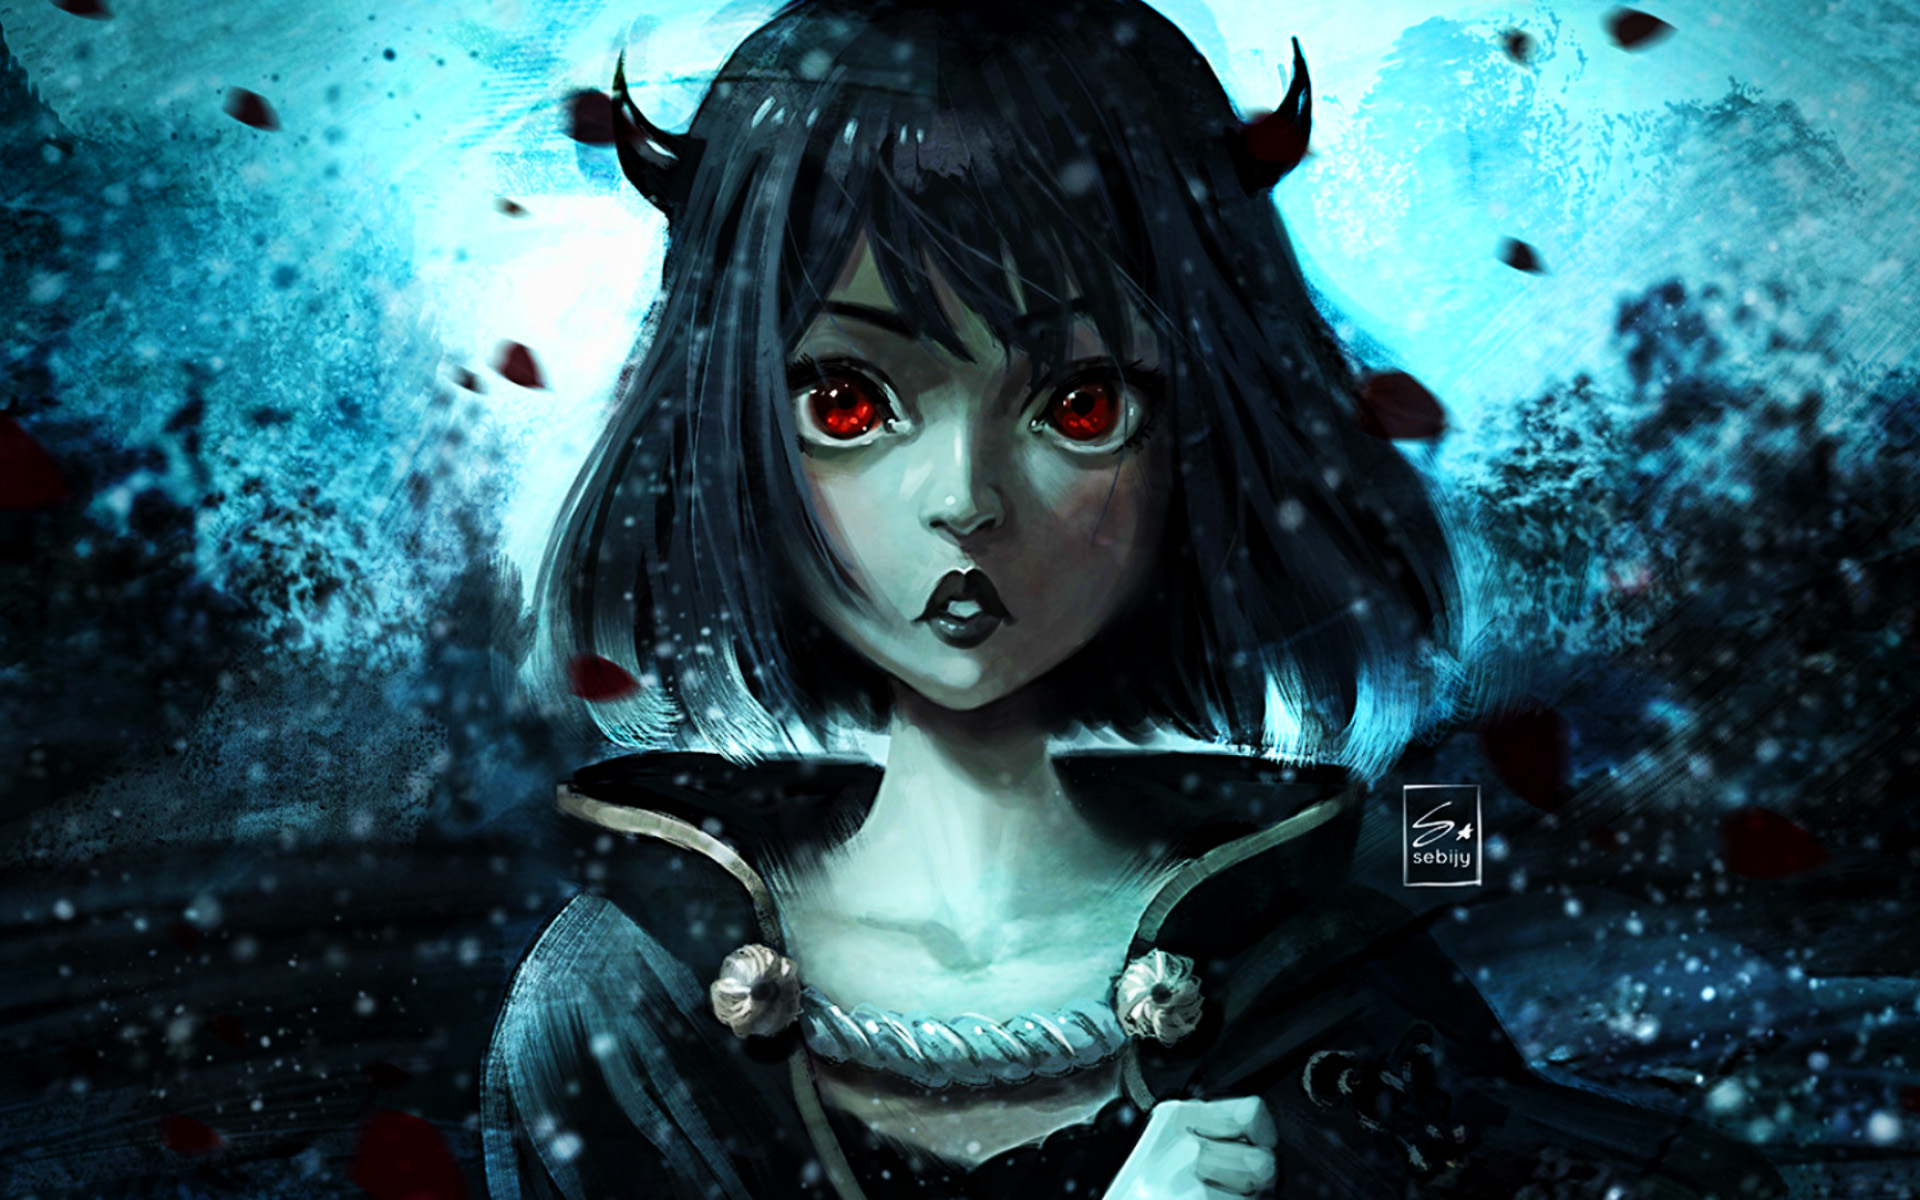 Secre Swallowtail Manga Black Clover Darkness Girl Nero Black Clover Wallpaper Pc 1920x1200 Download Hd Wallpaper Wallpapertip